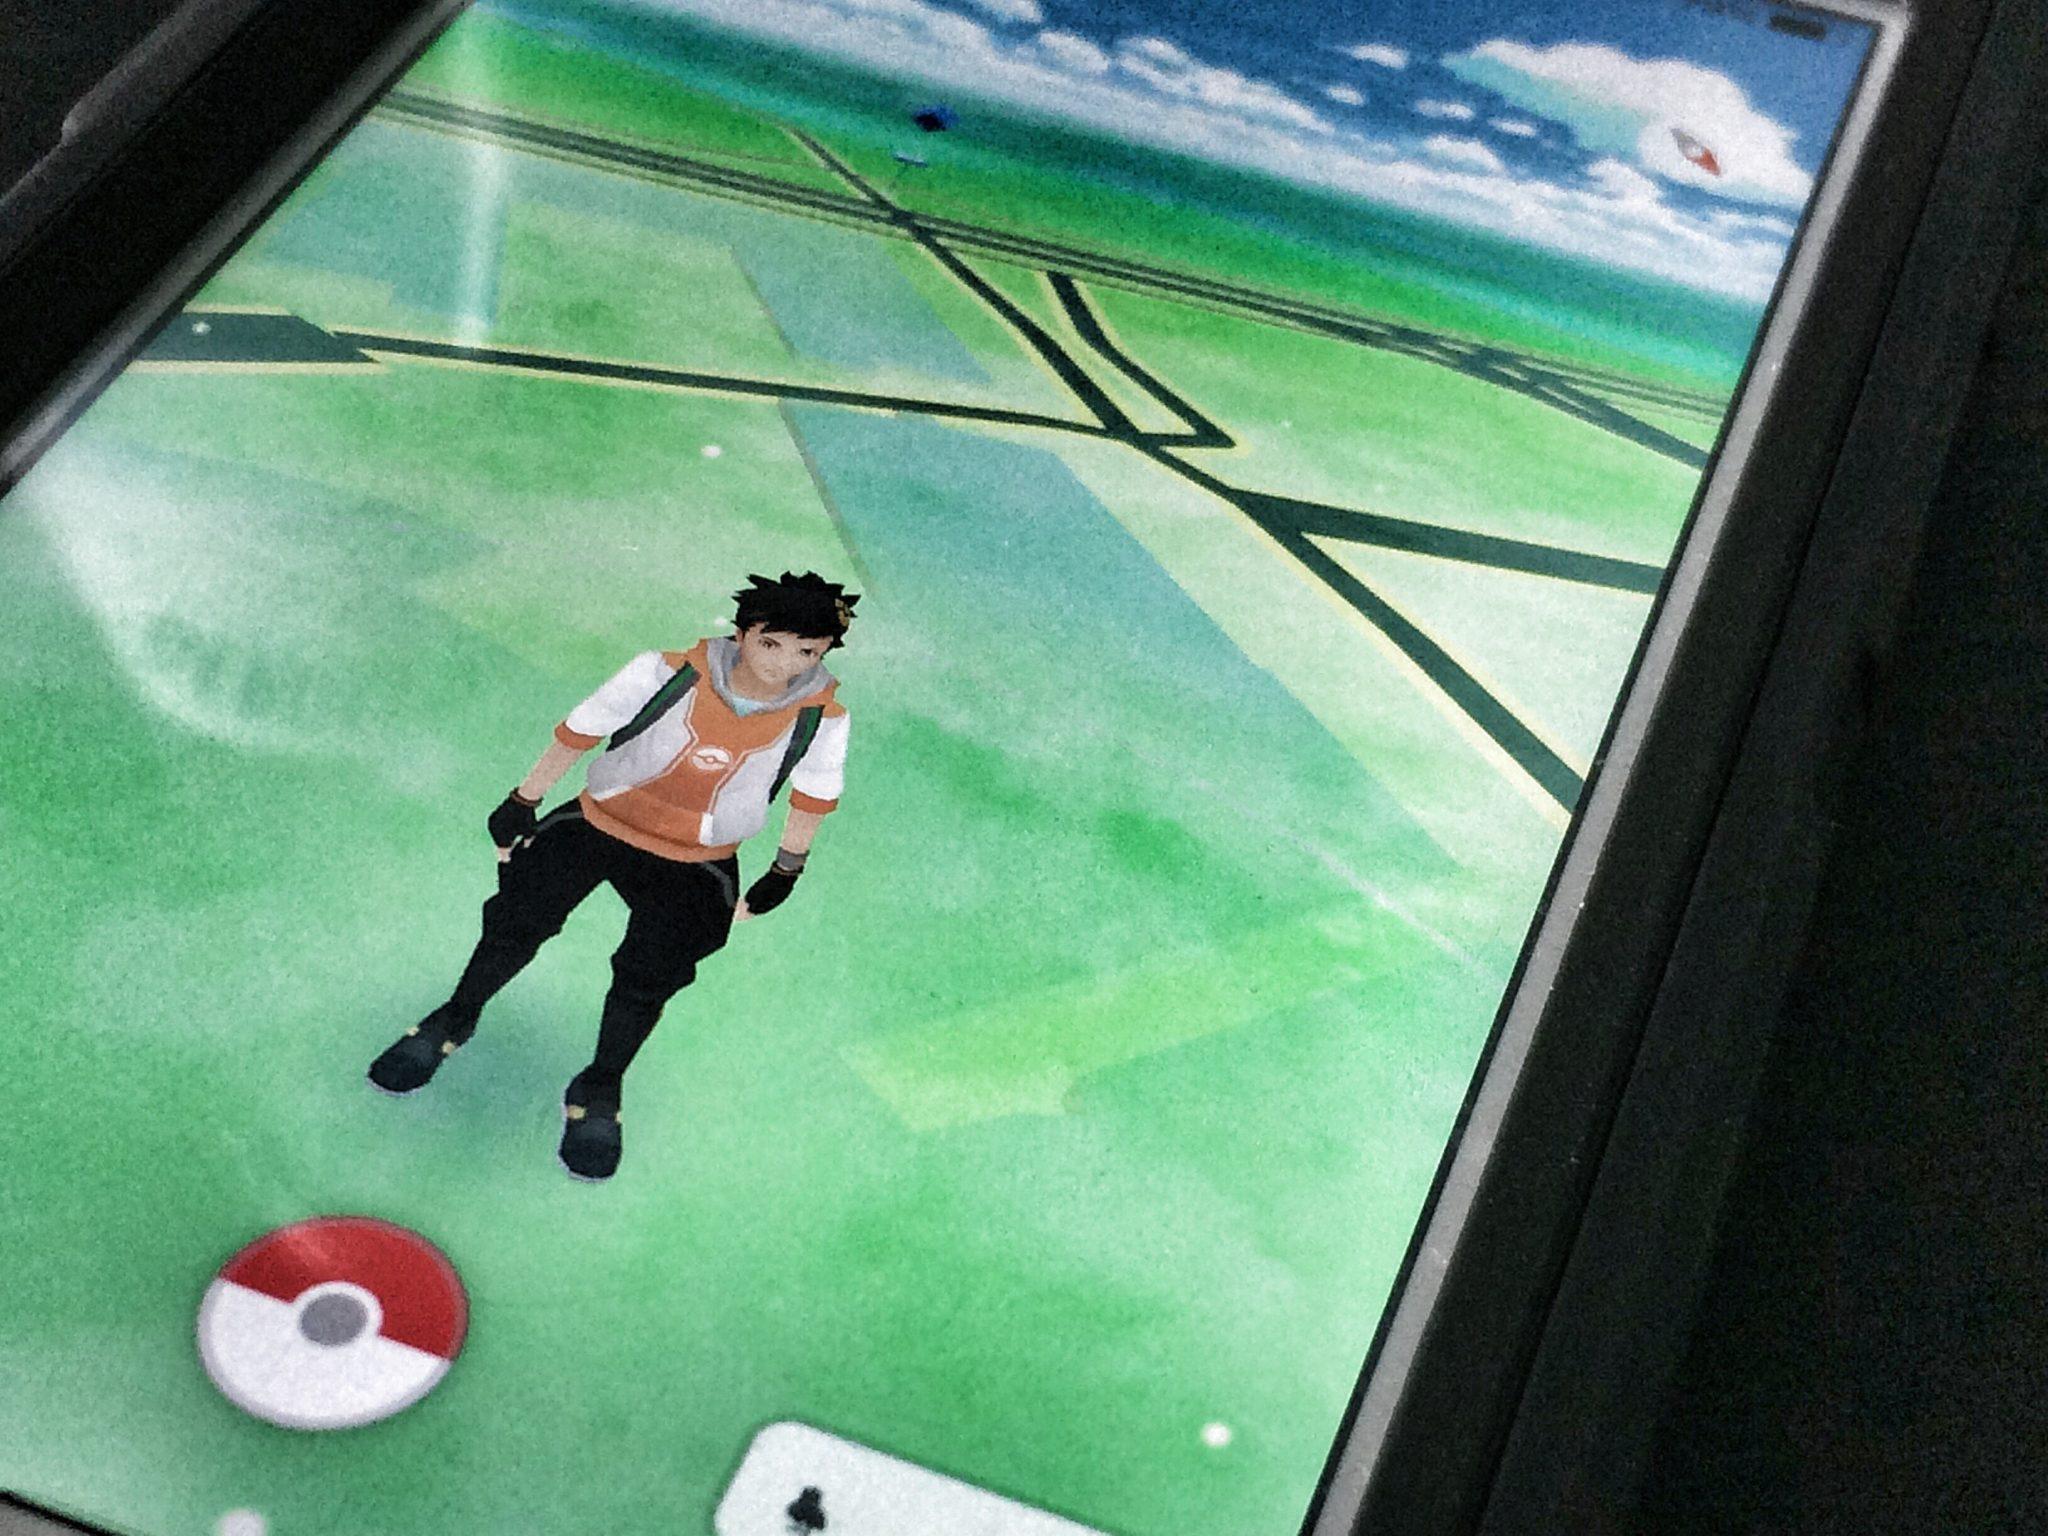 Virtual exercise becomes real with PokemonGO